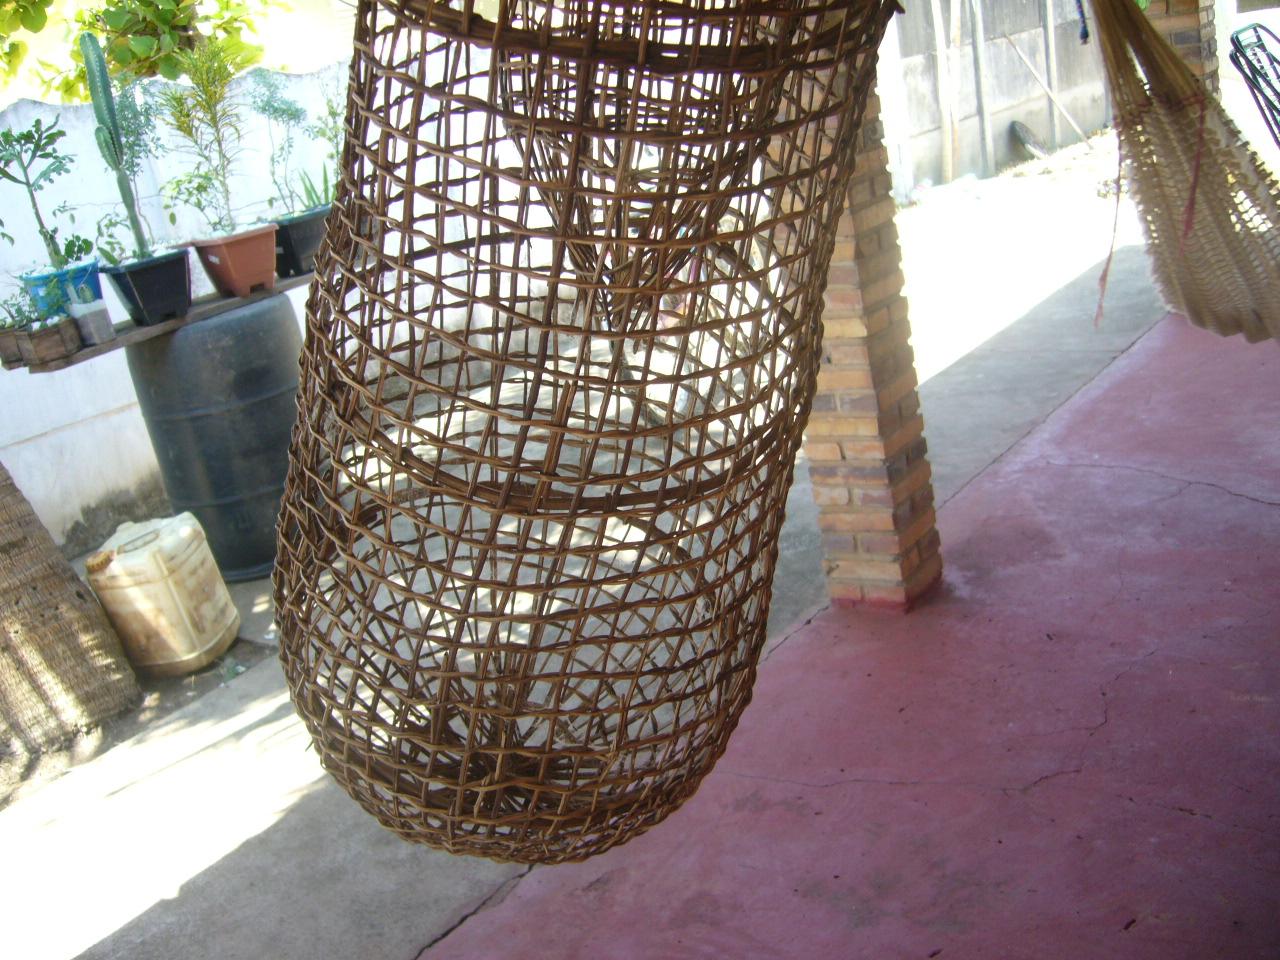 Adesivo De Unha Flamingo ~ Artesanato Indígena Xinguano ARMADILHA DE PESCA